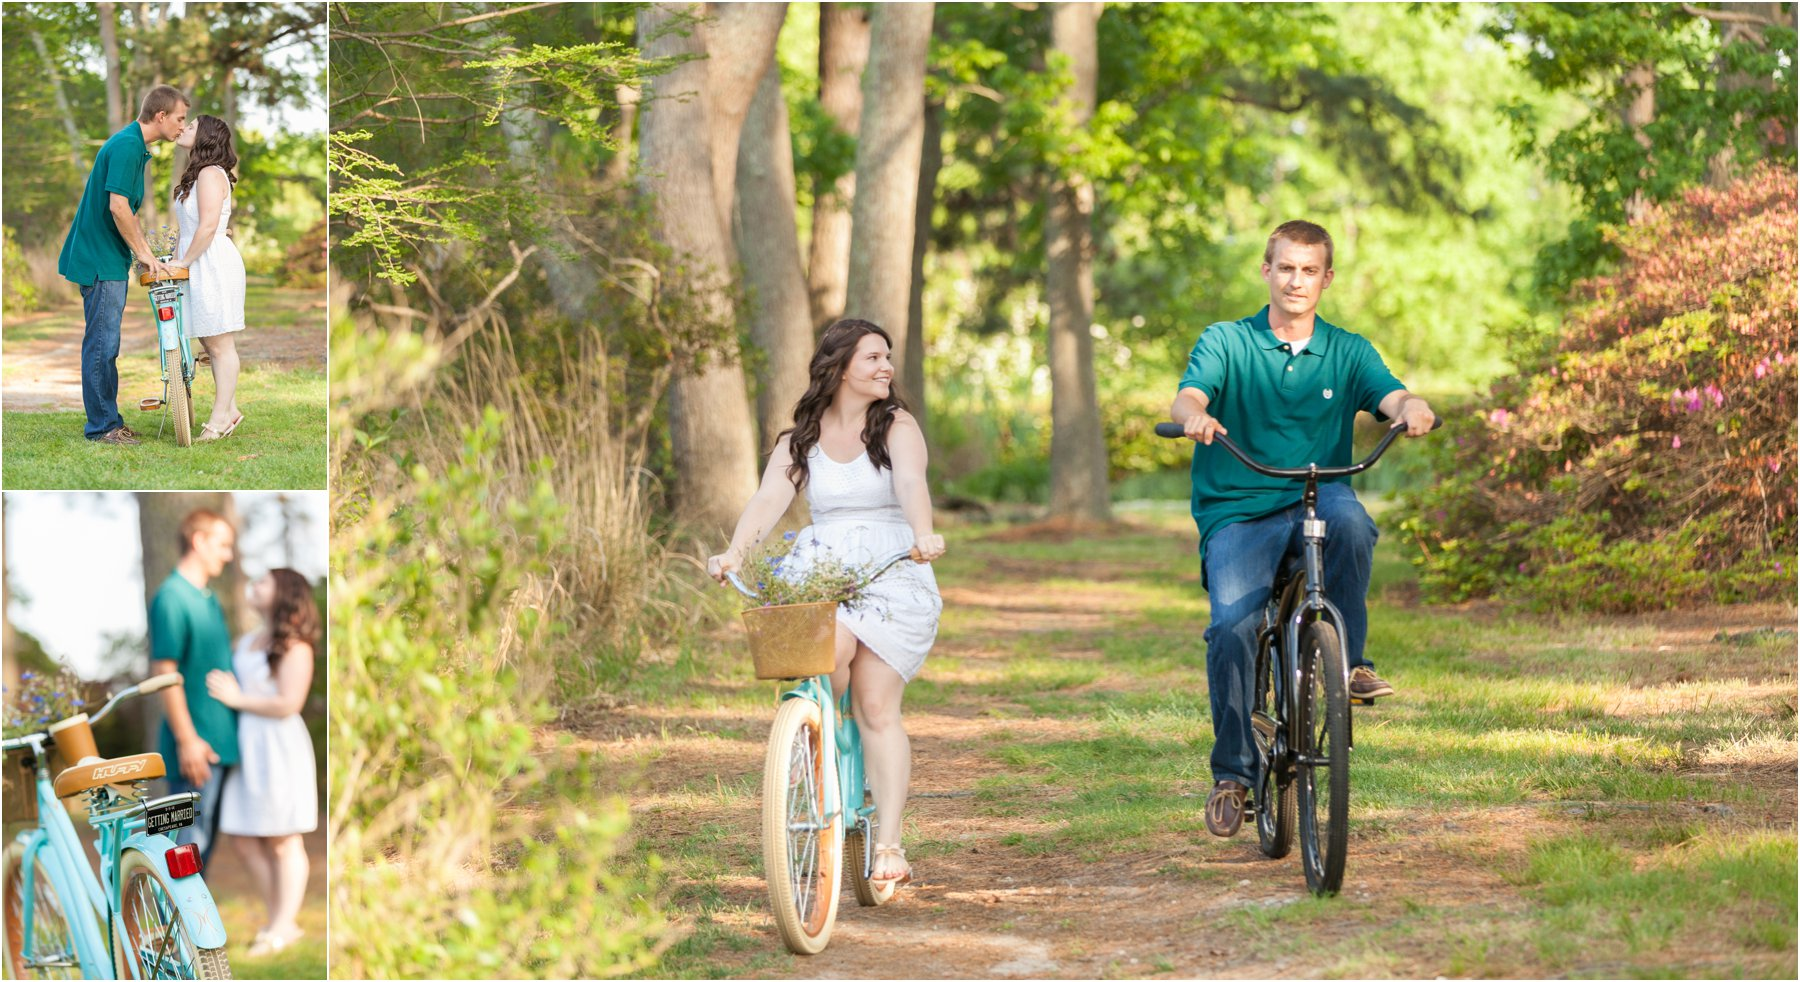 engagement_Photography_bike_ride_engagements_Jessica_Ryan_Photography_virginia_virginia_beach_0316